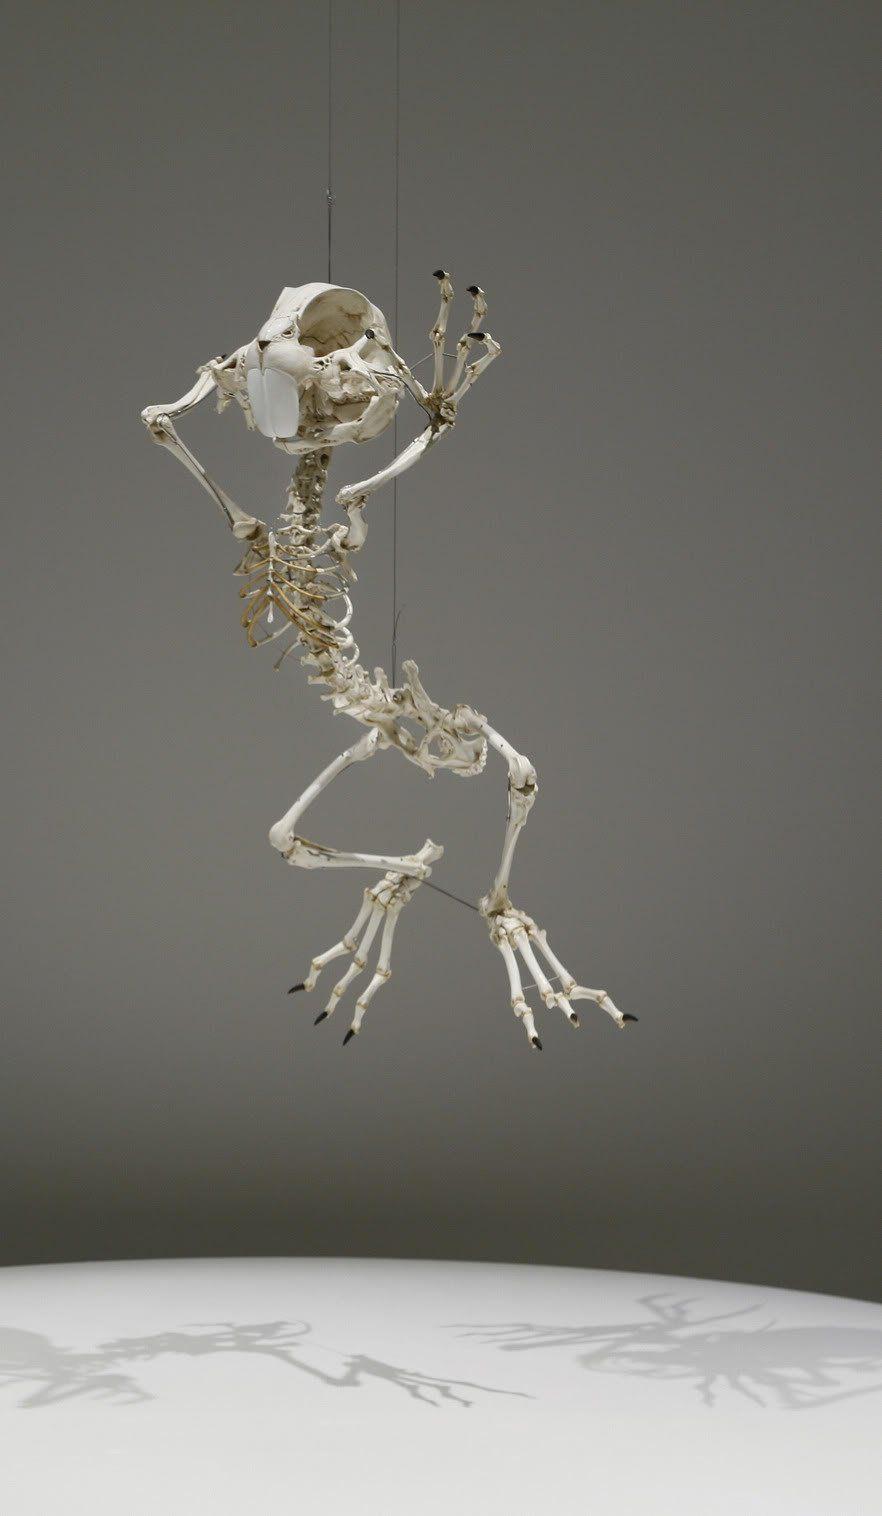 Homo Animatus Project by Hyungkoo Lee